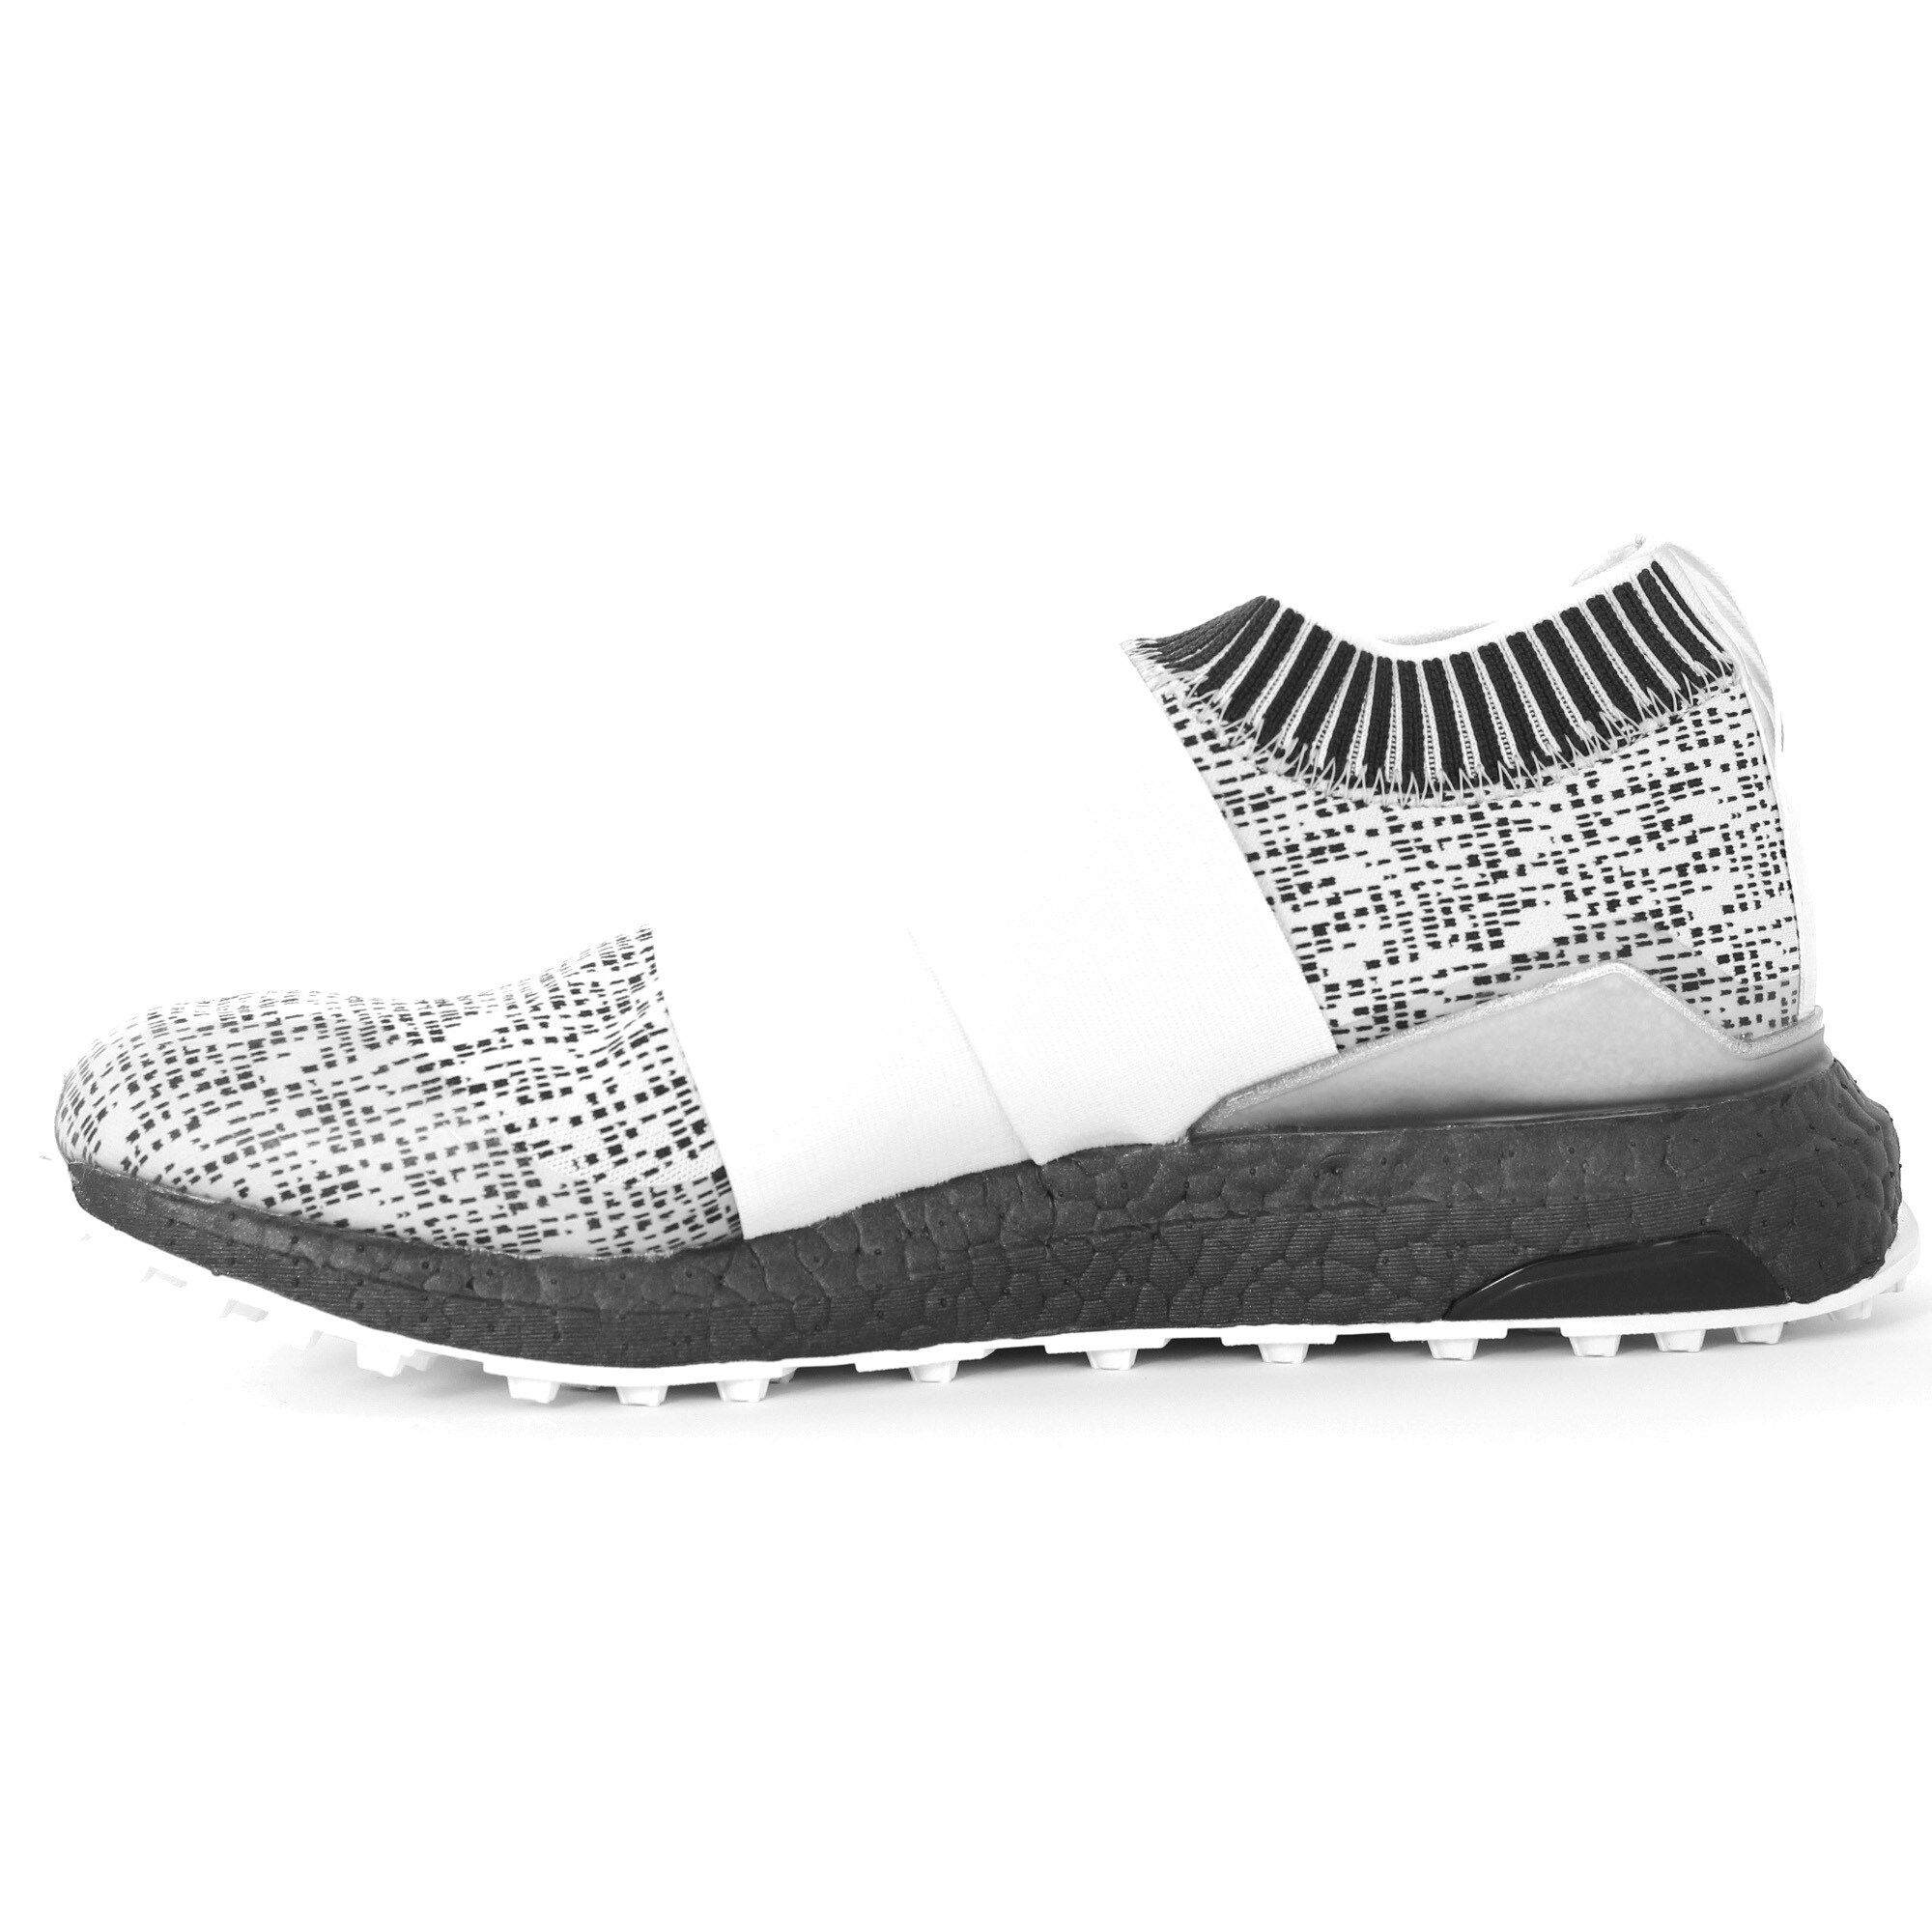 shoes 2018 adidas